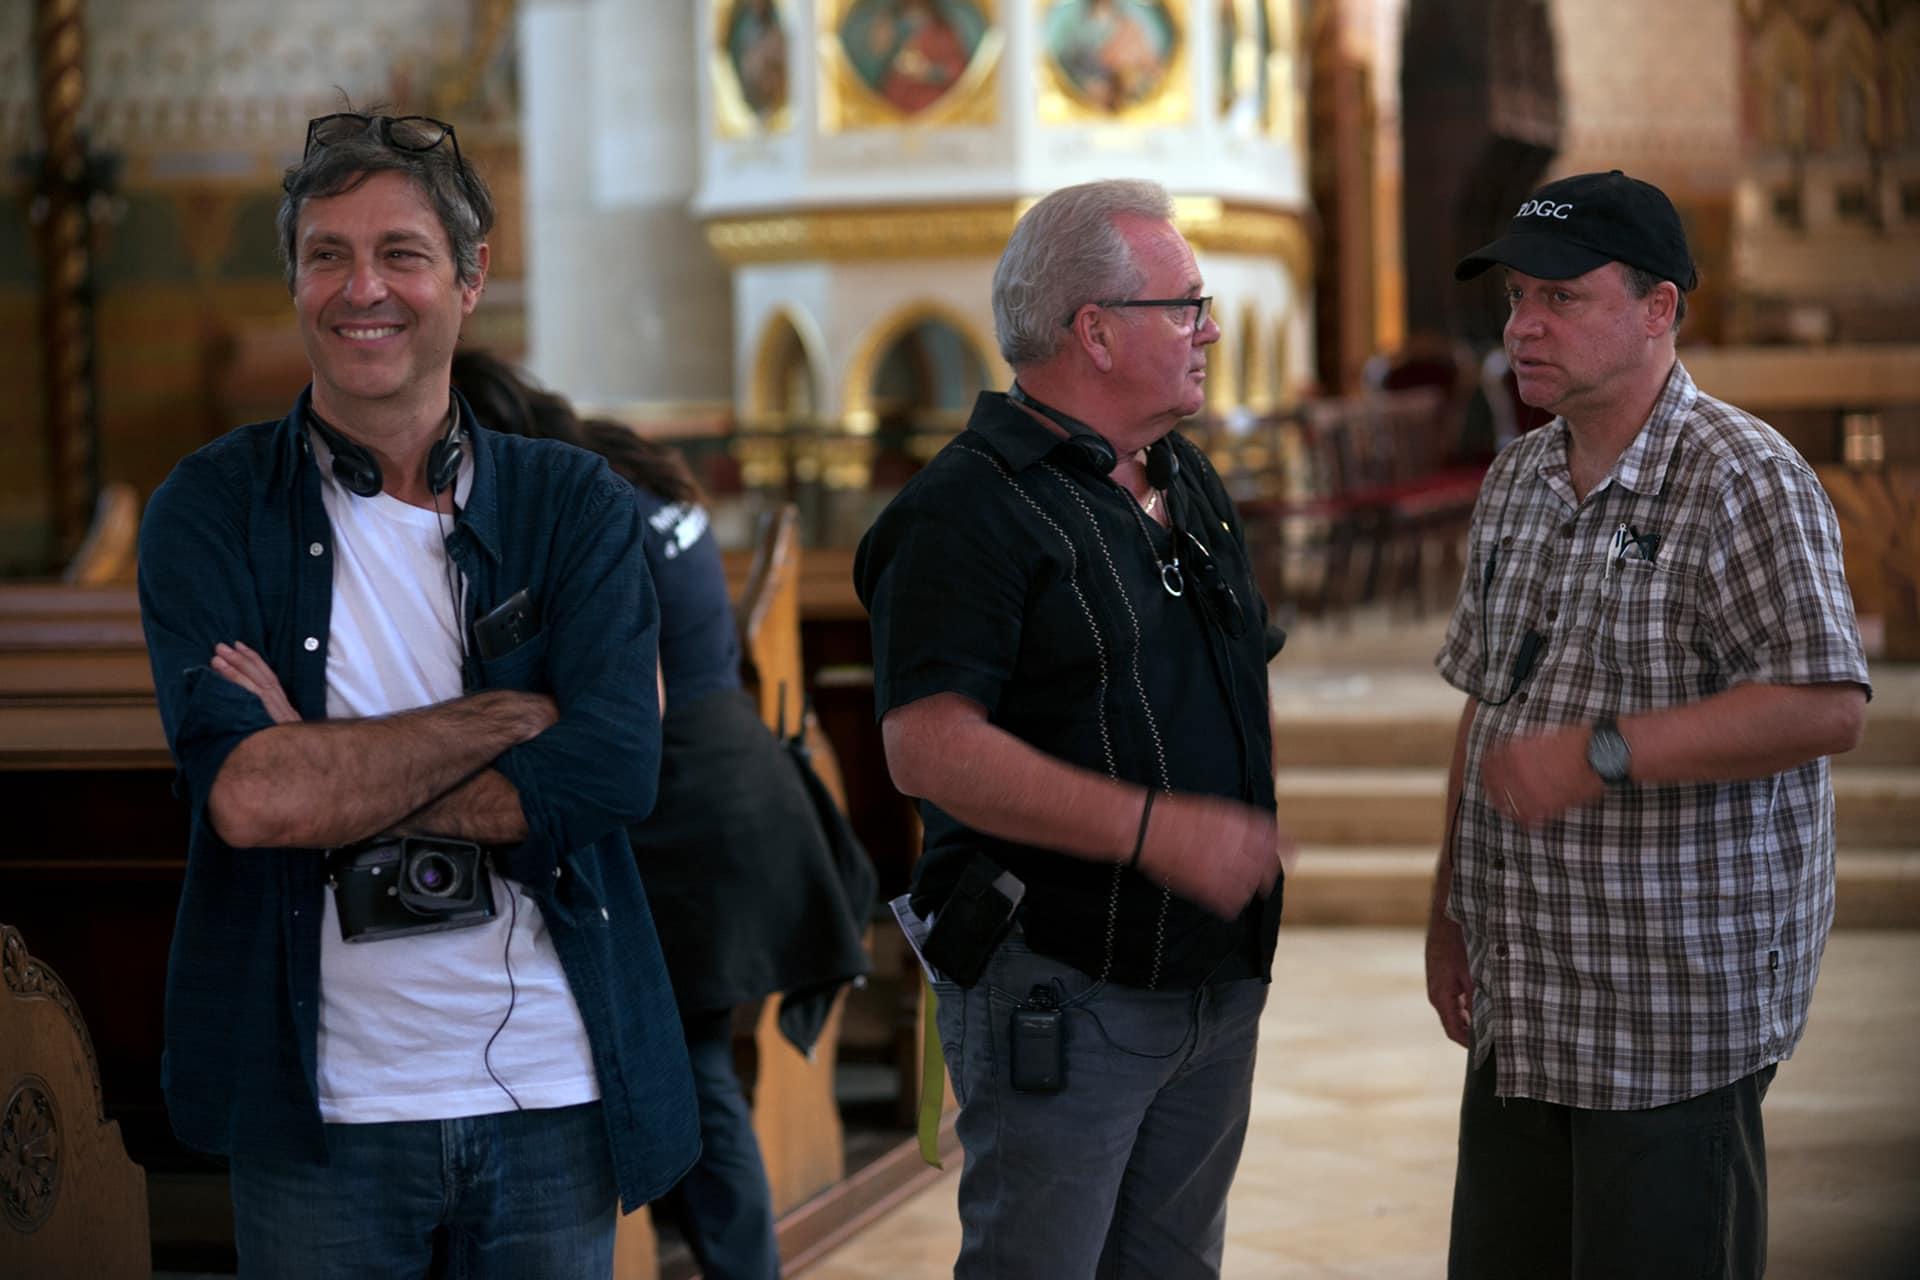 Director Paolo Barzman, Producer John Calvert and 1st AD Marcel Saumure on the set of X Company Season 3.